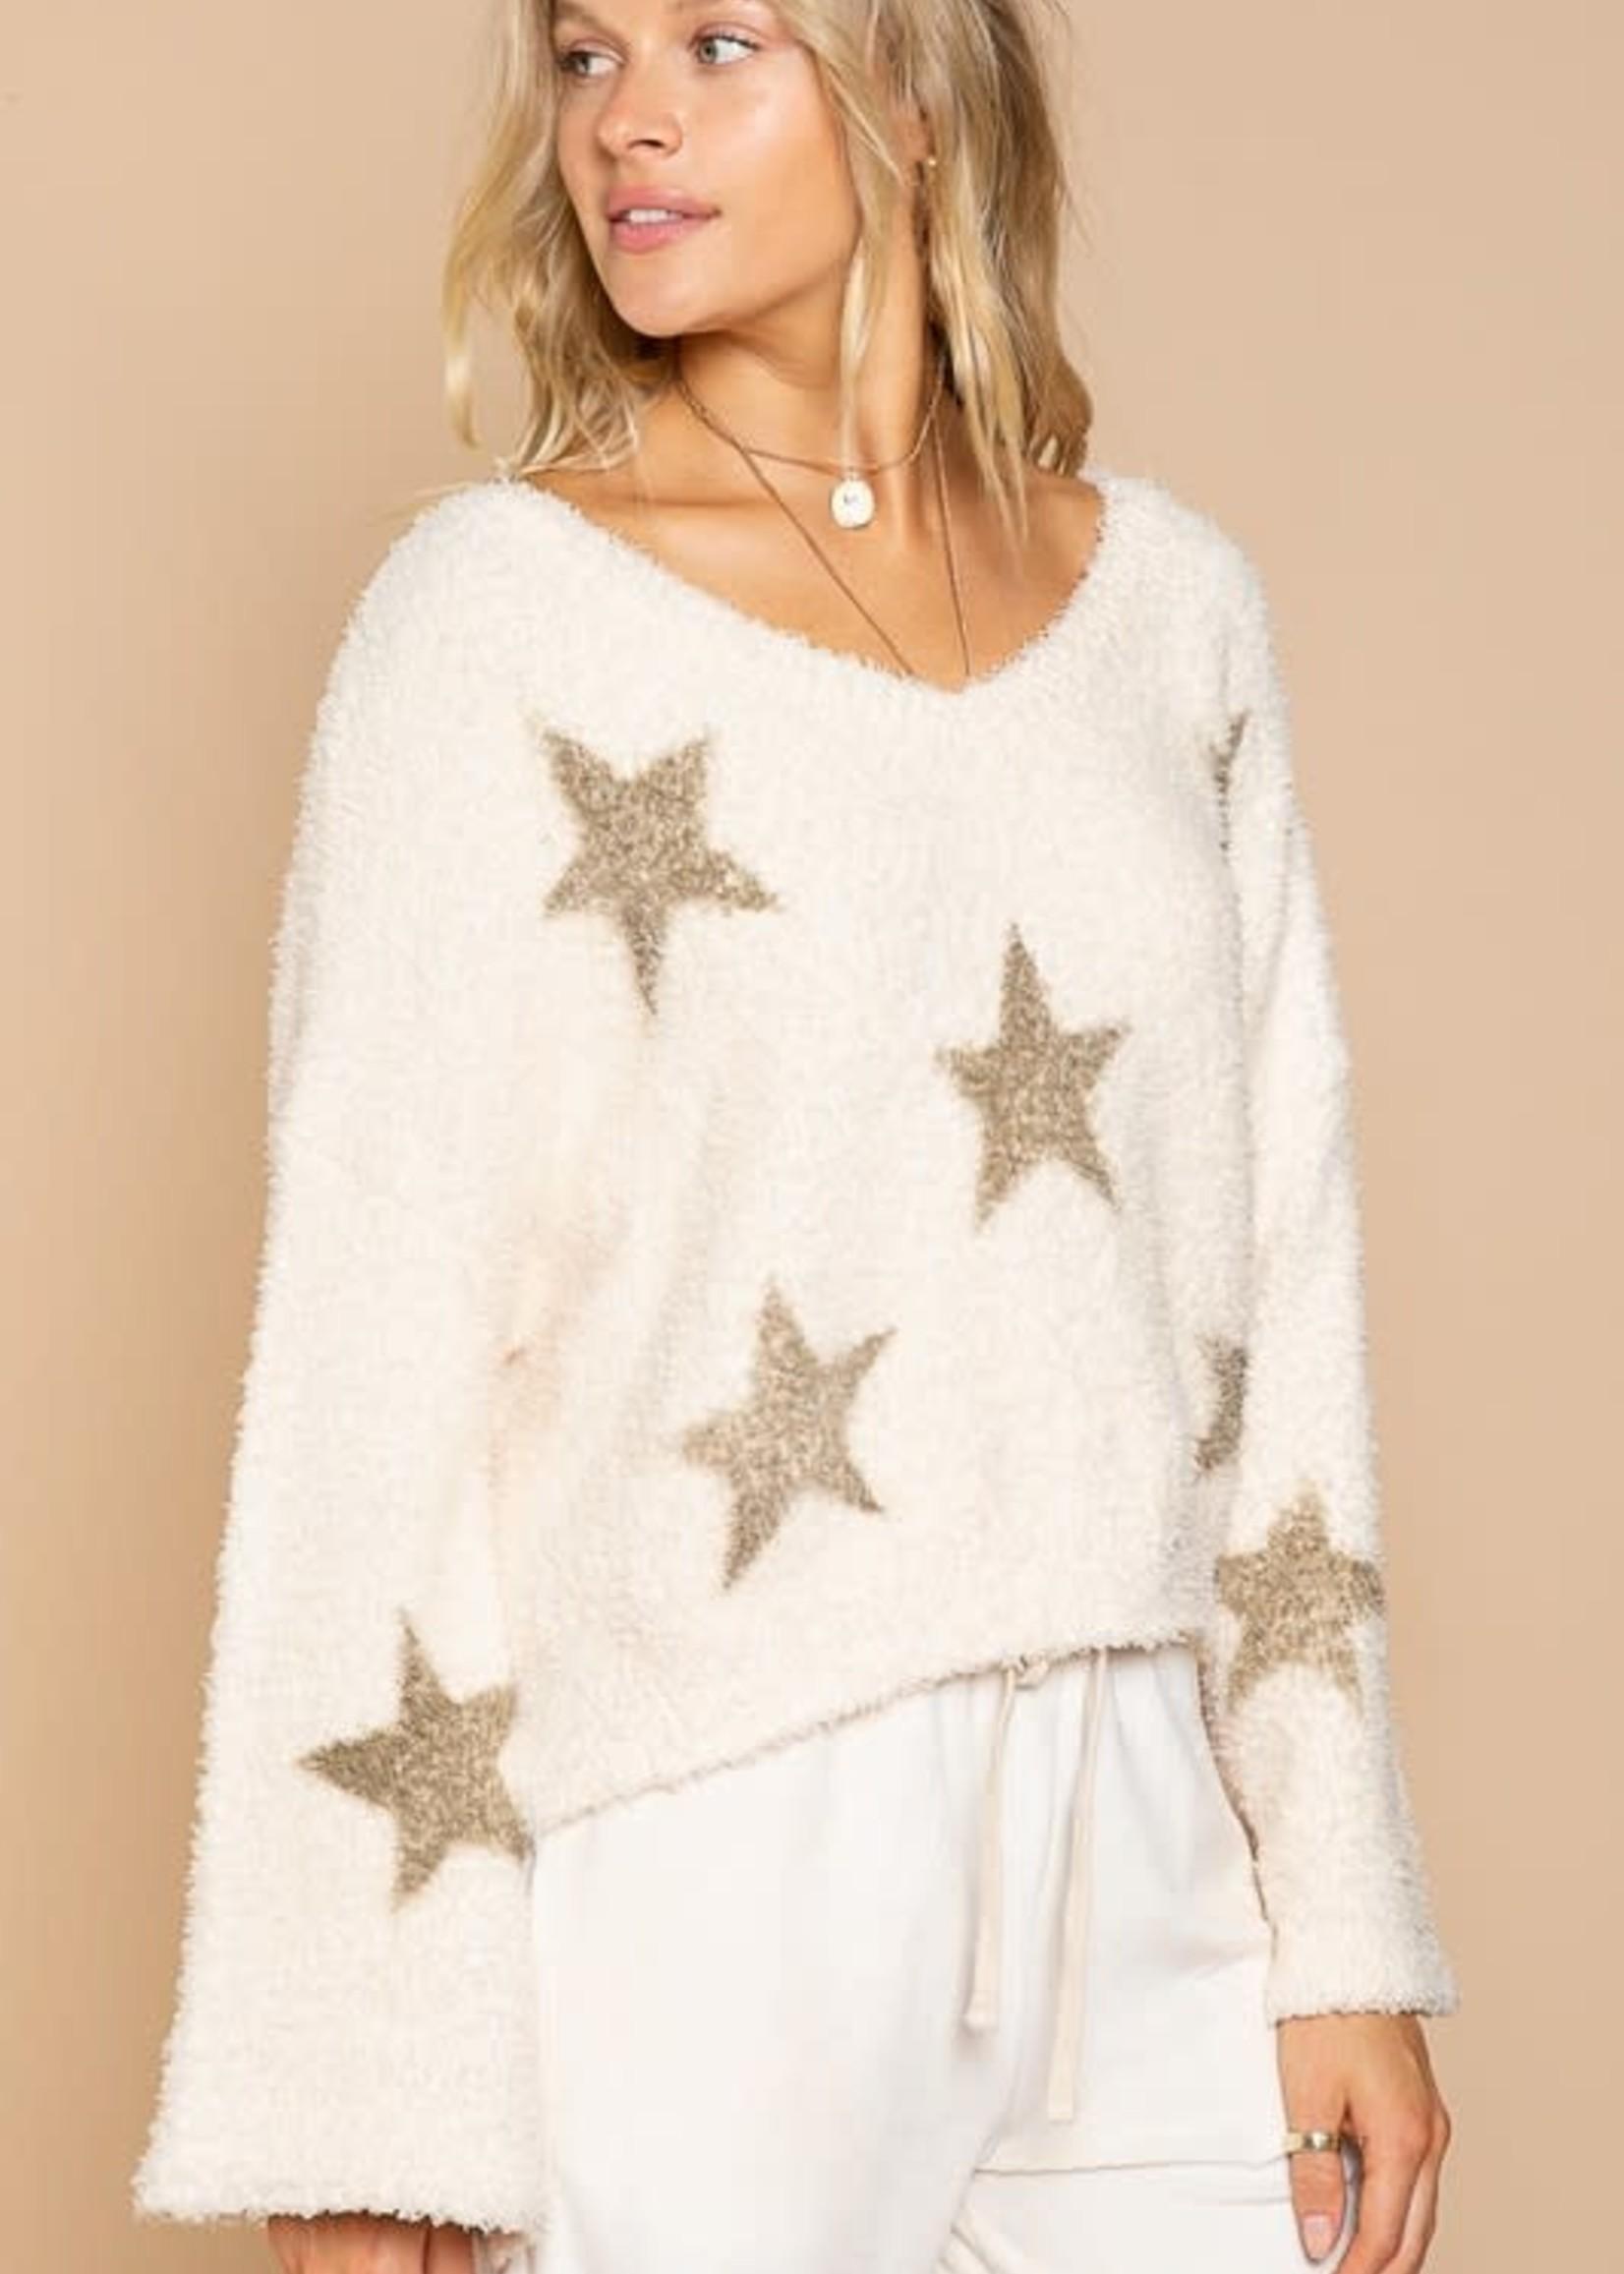 Softest Star Sweater Ever